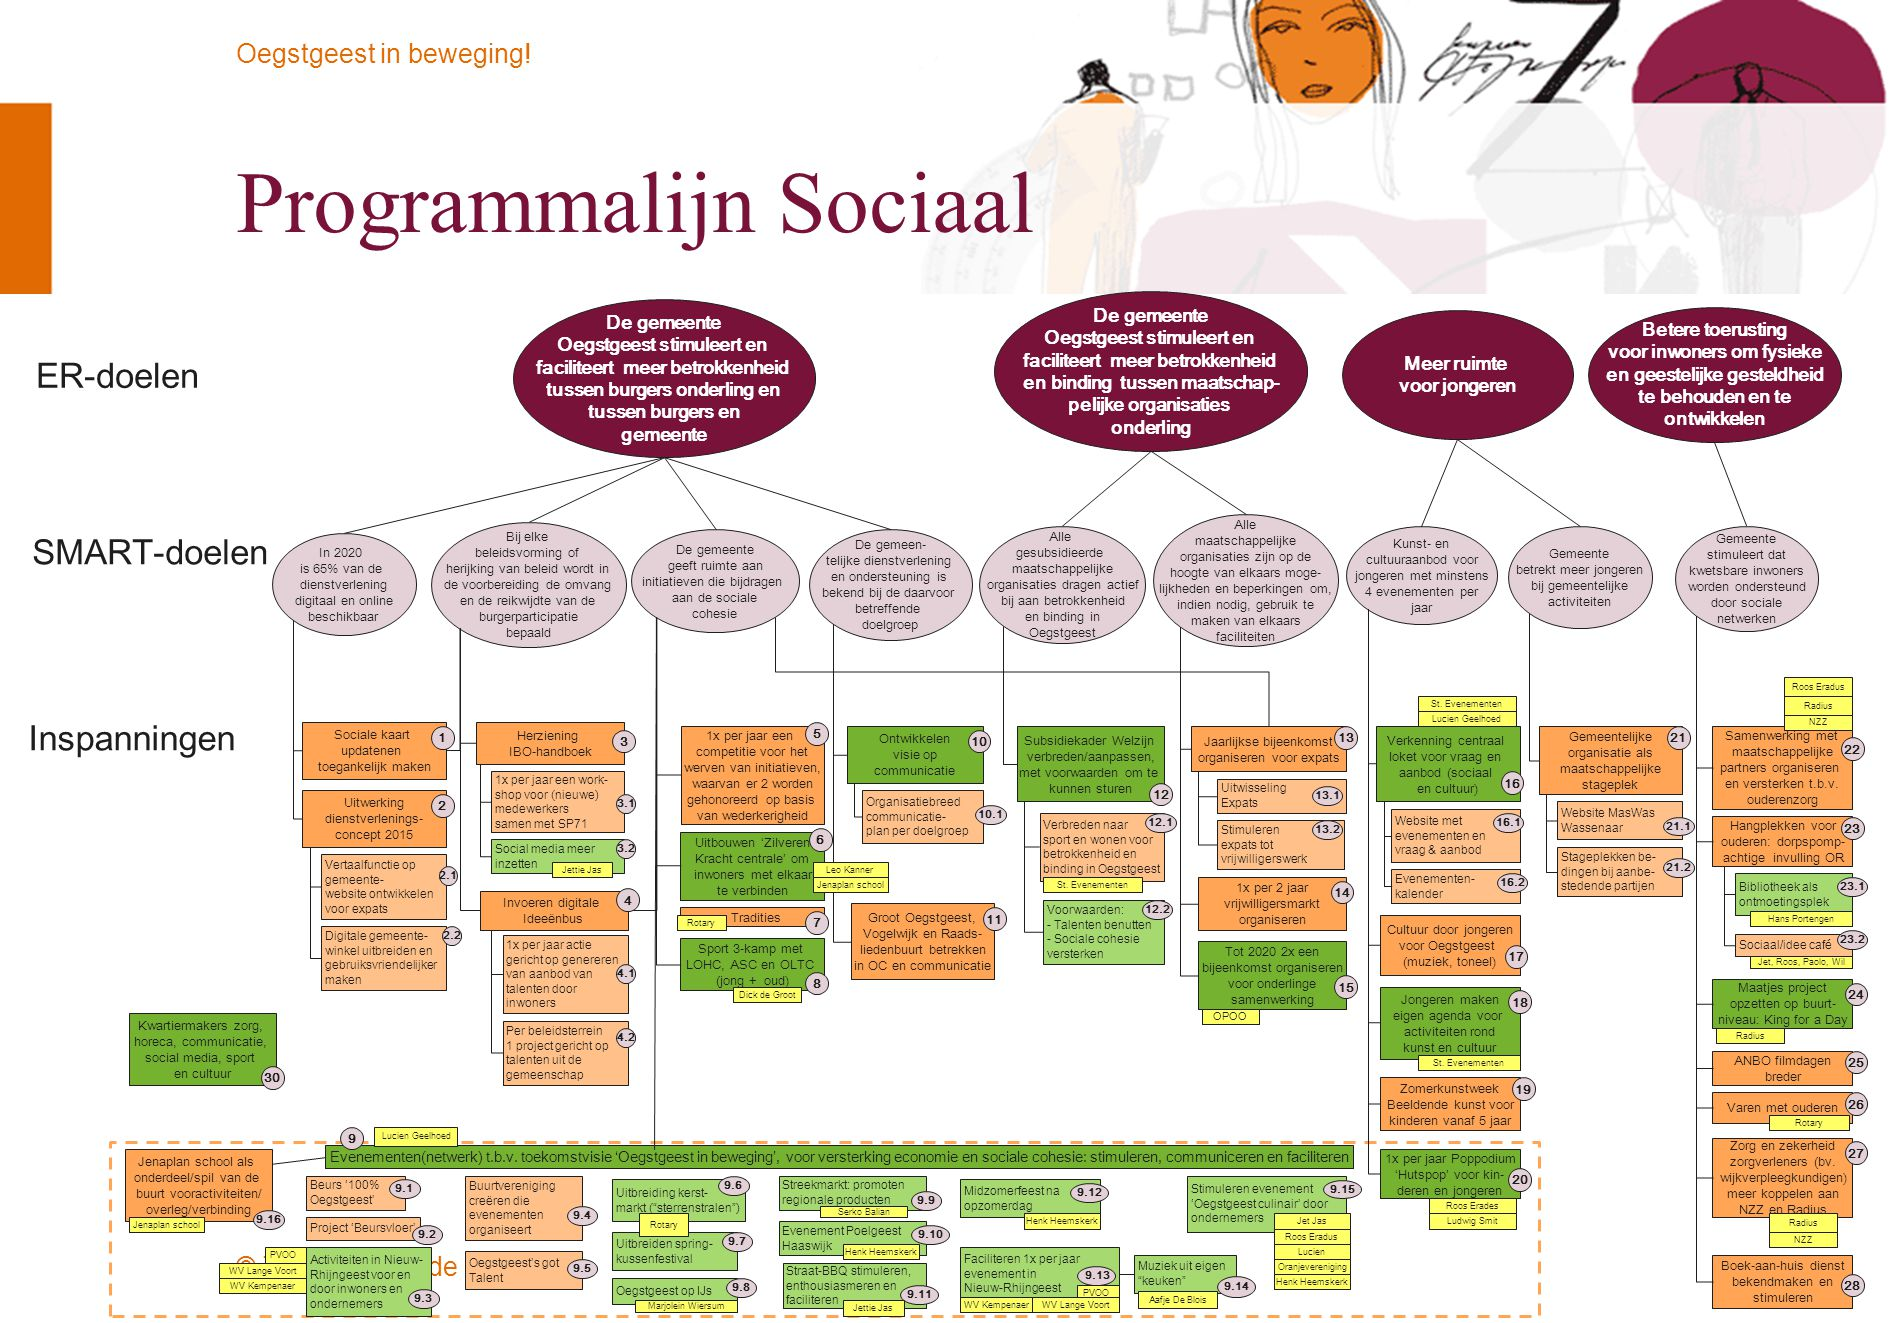 Programmalijn Sociaal